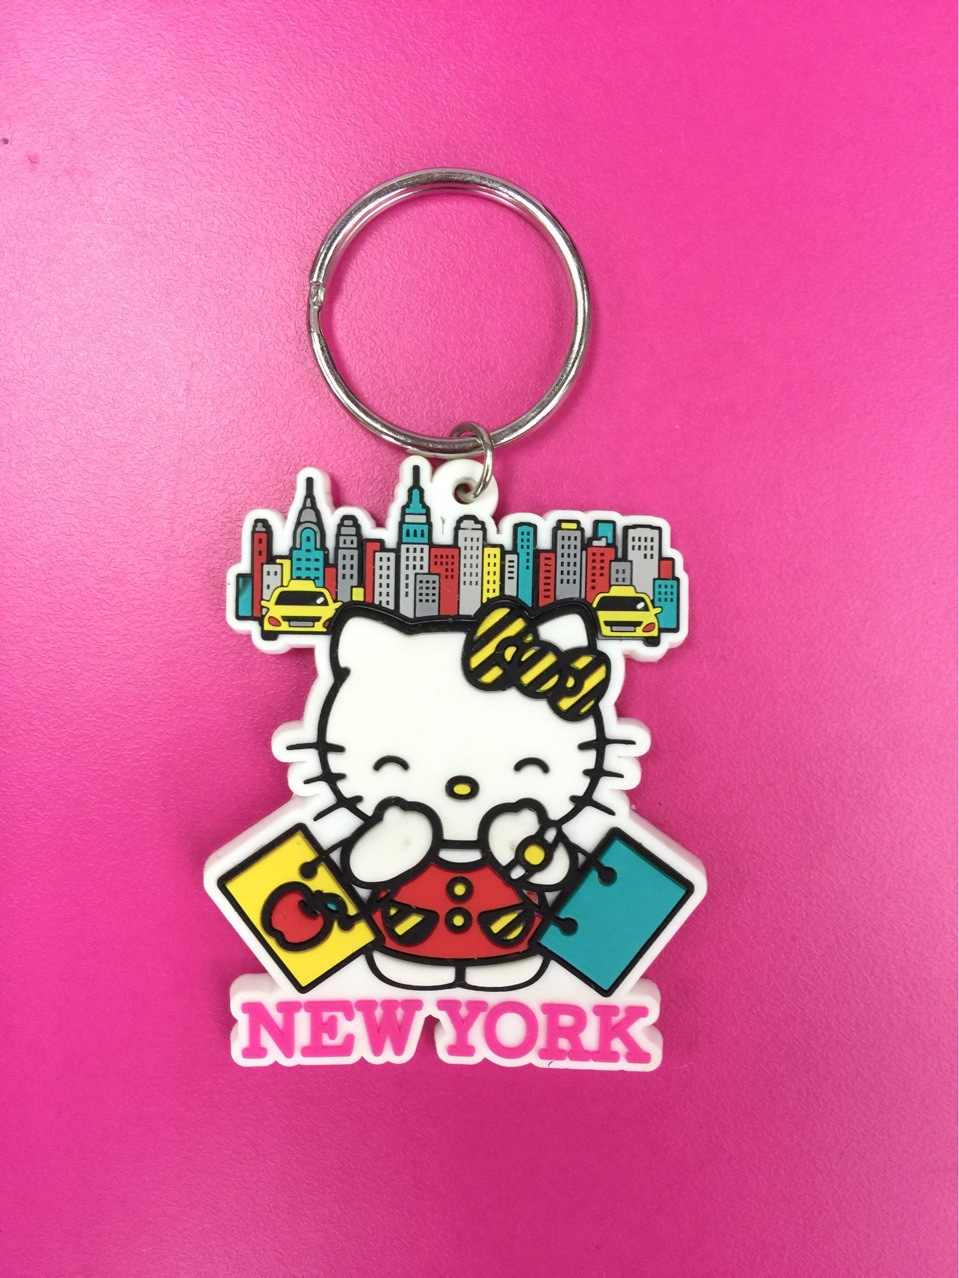 G604 Sanrio Olá Kitty Original Japonês anime figura de borracha de Silicone do telefone móvel encantos cinta keychain